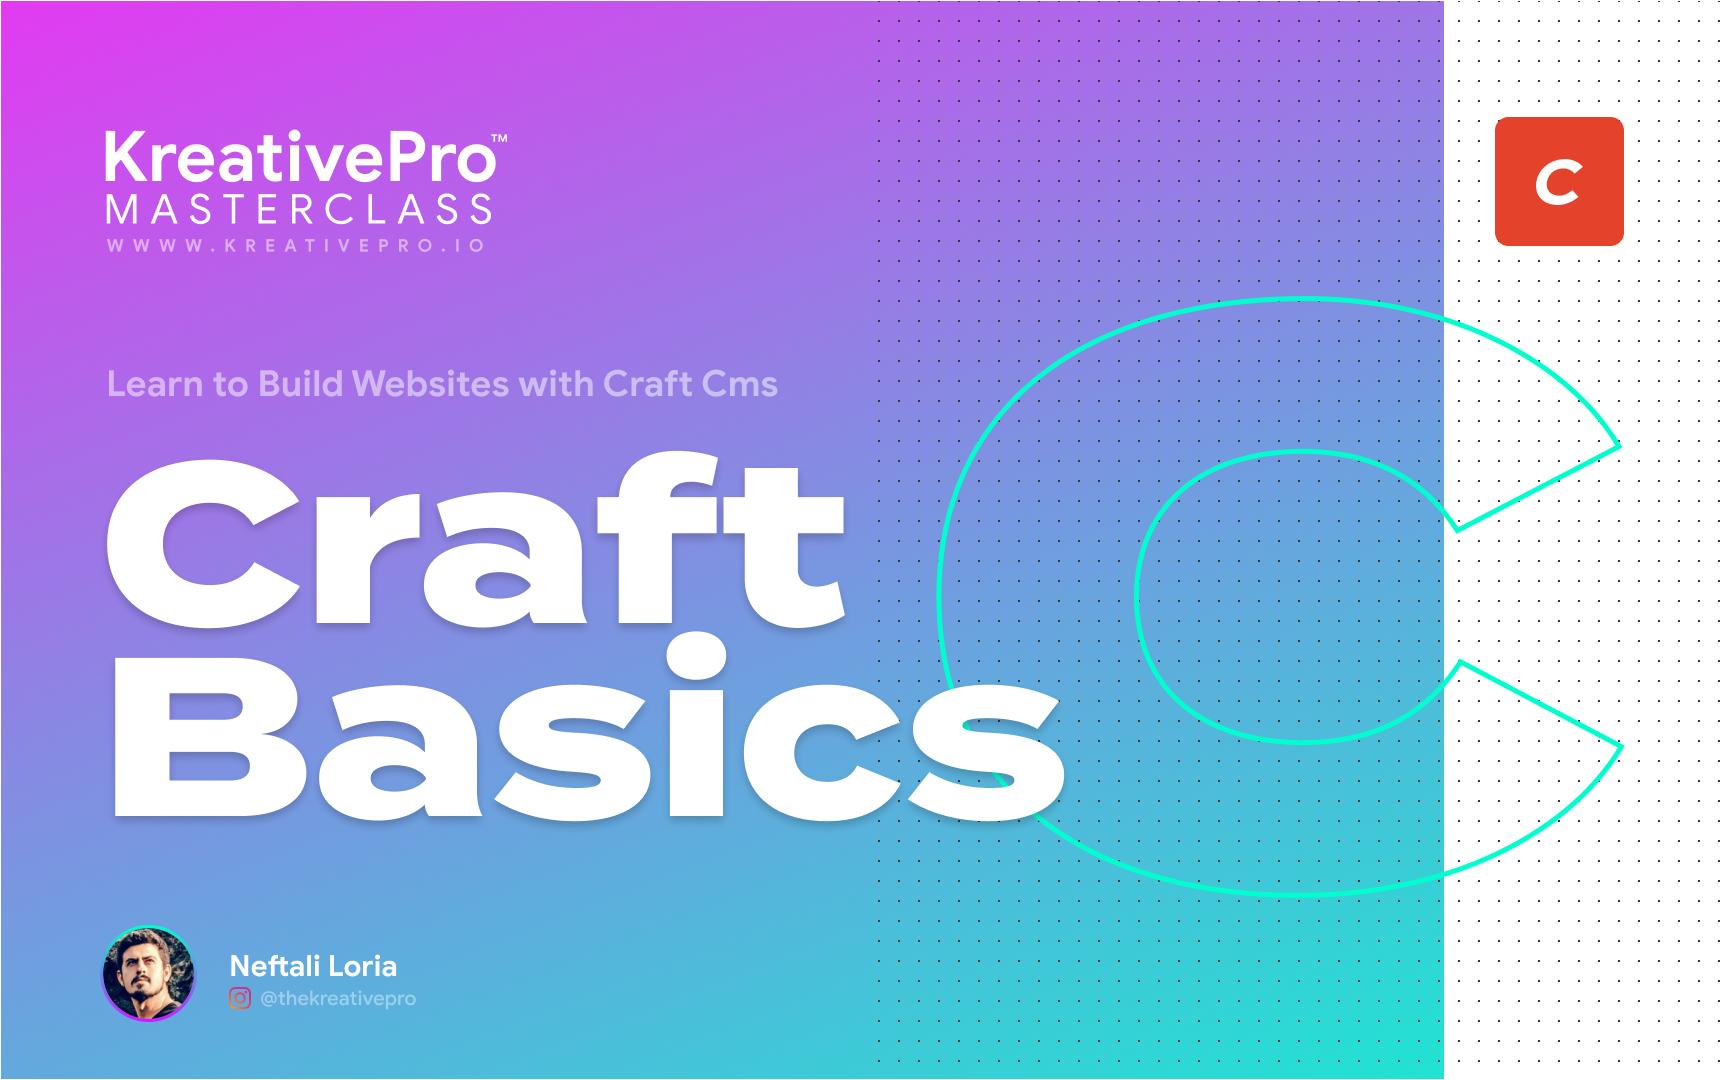 Craft 2.0 - Craft Essentials